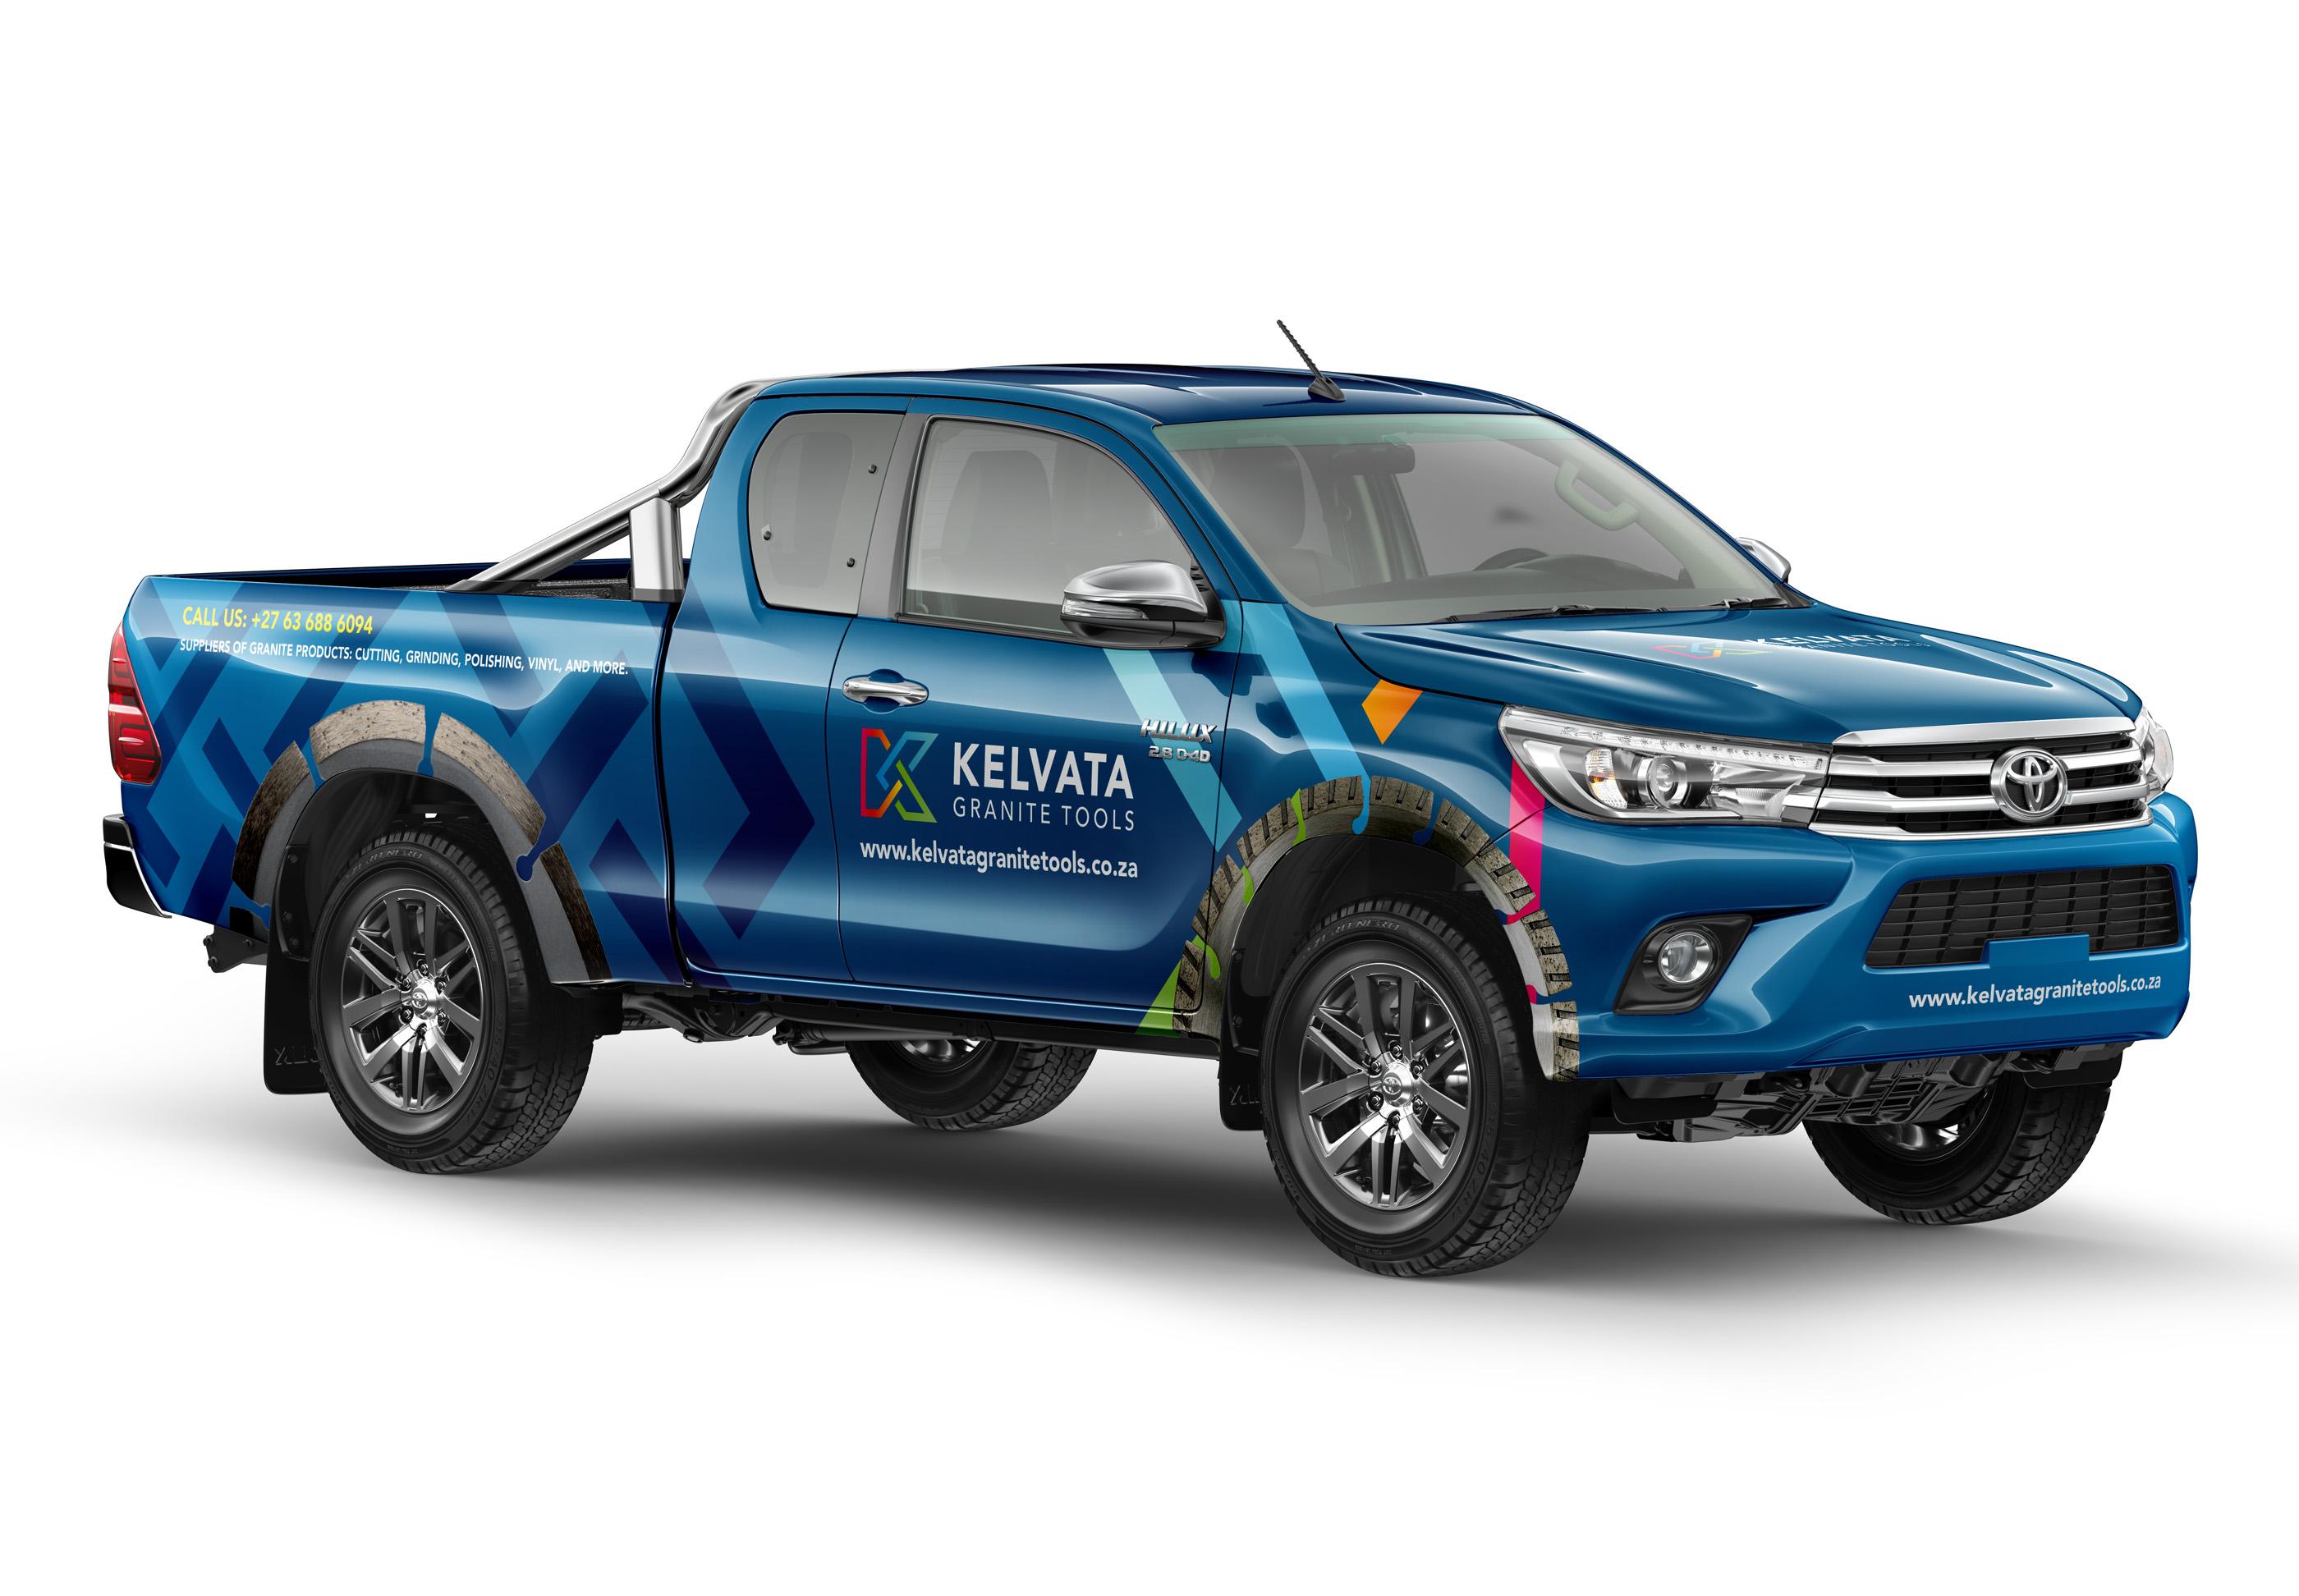 Kelvata-Vehicle-Wrap-Branding-Graphic-Design-by-Agent-Orange-Design.jpg